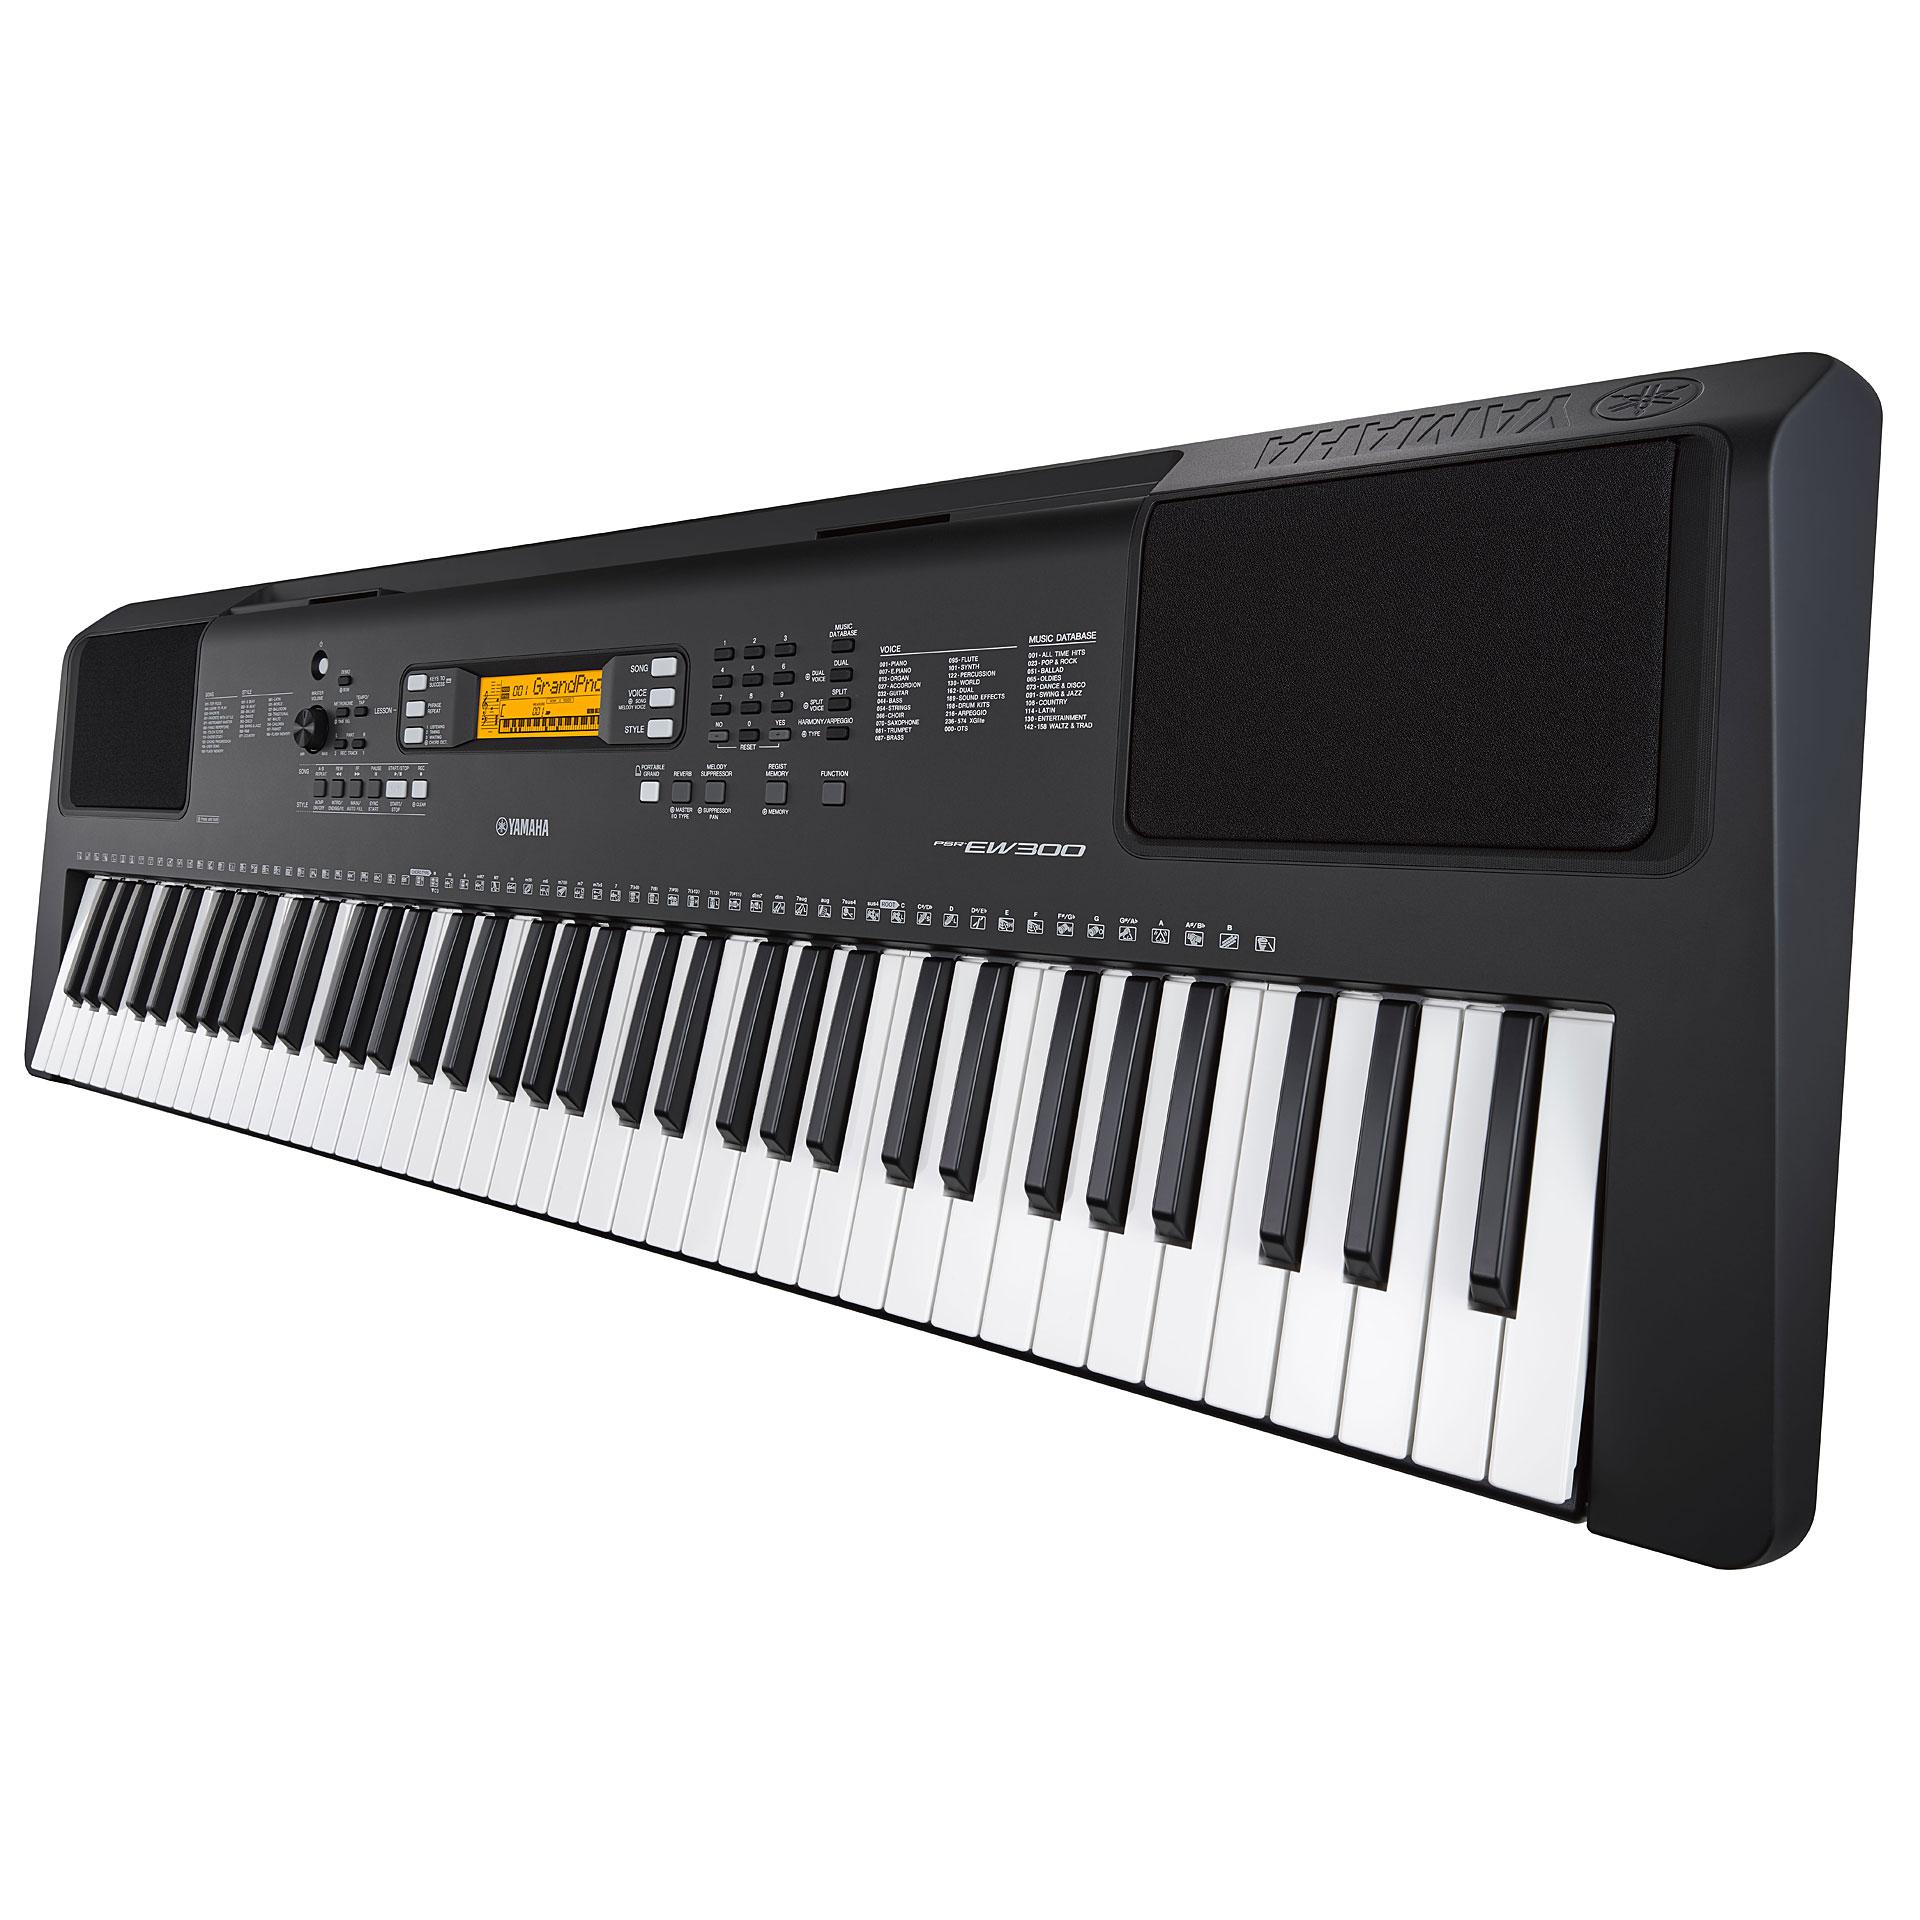 Yamaha Psr Ew300 Keyboard Workstation : yamaha psr ew300 10103417 keyboard ~ Russianpoet.info Haus und Dekorationen